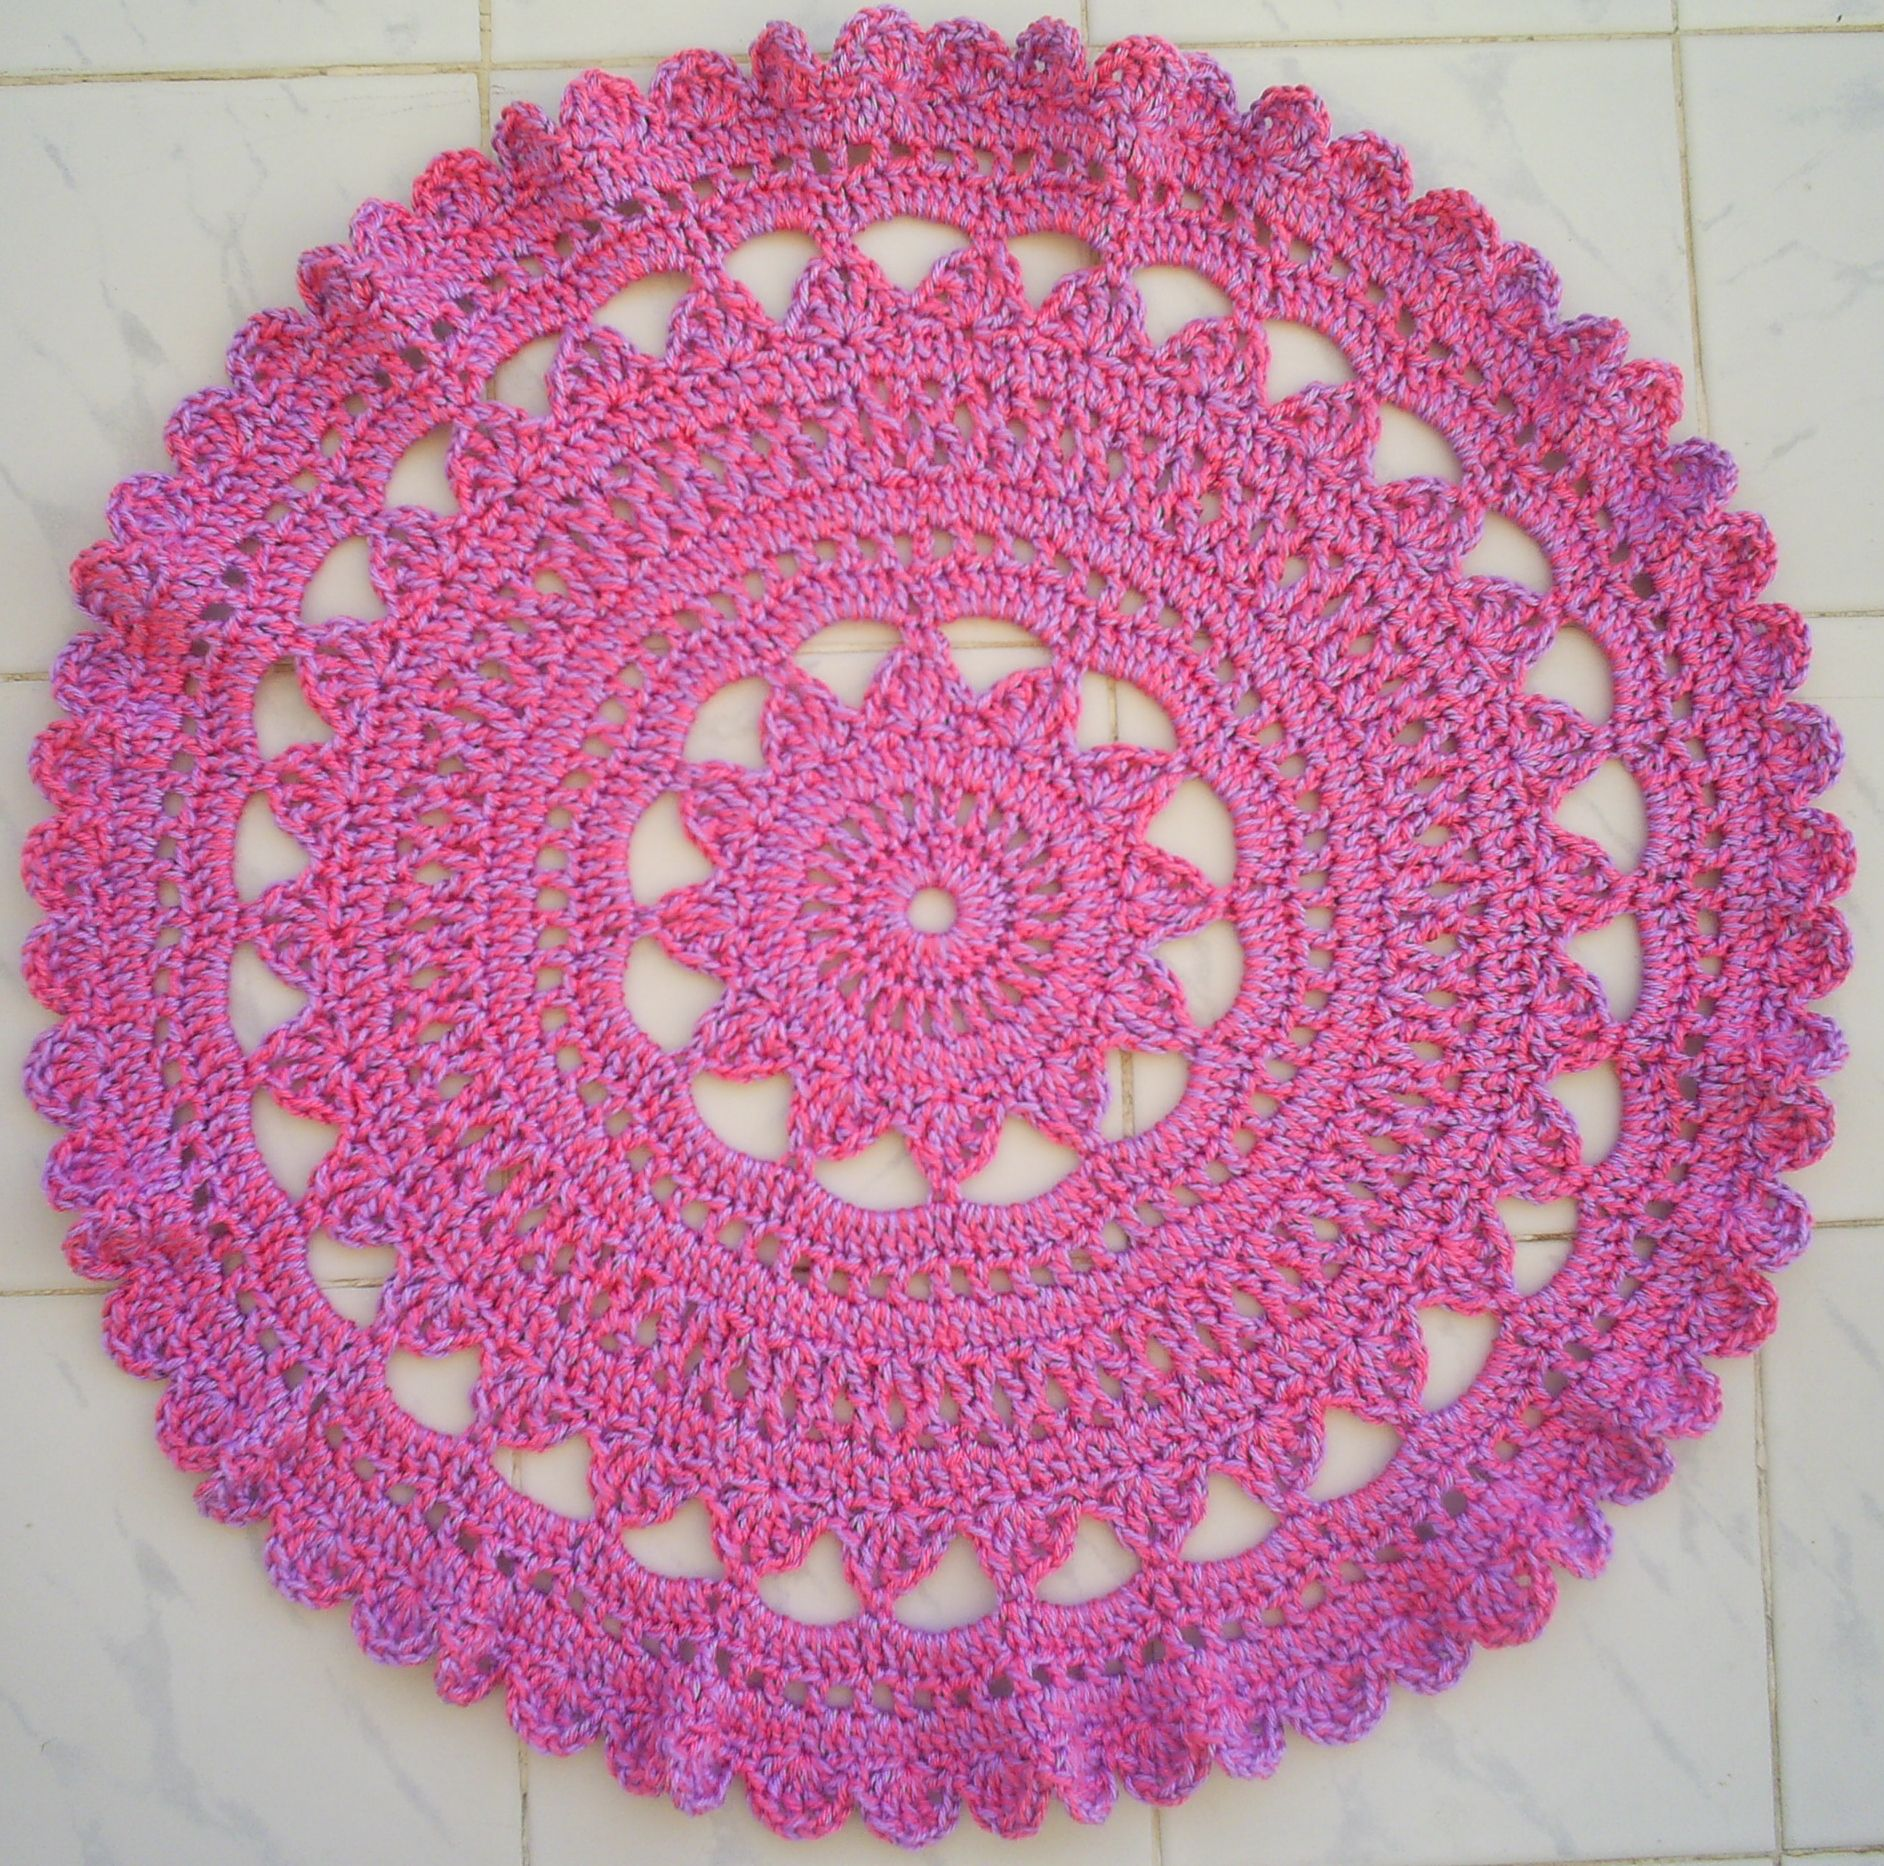 Crocheting Rugs : crochet rug Yarn Fun! Pinterest